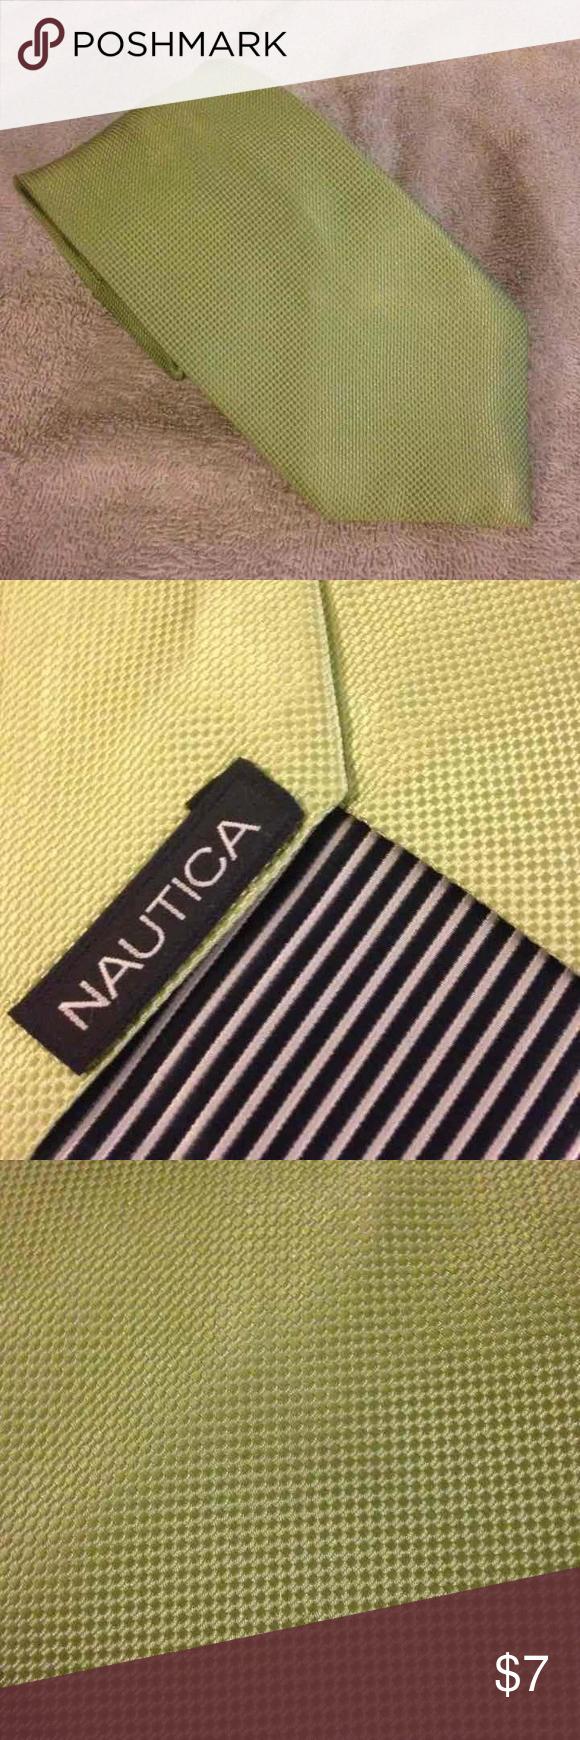 nautica customer service